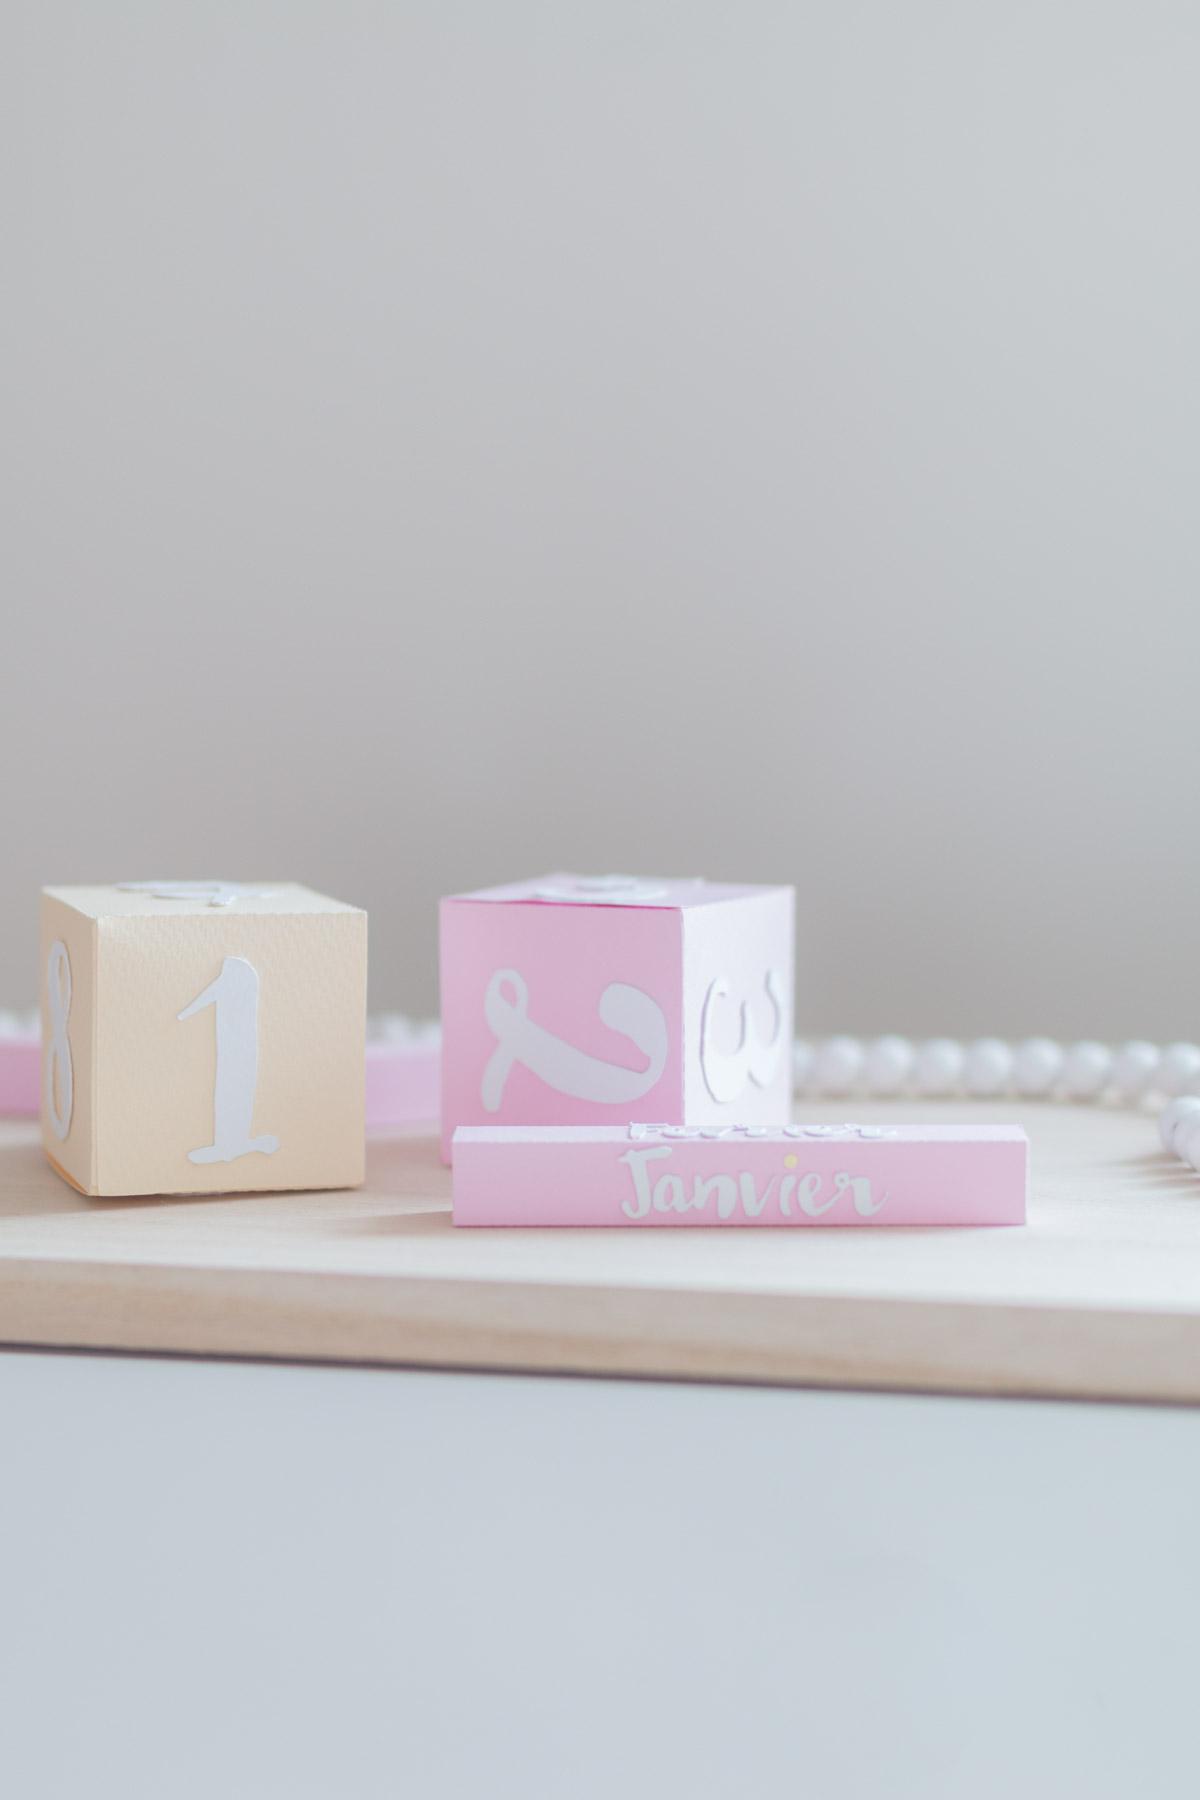 DIY Calendrier 3D en papier  I Sp4nkblog-12